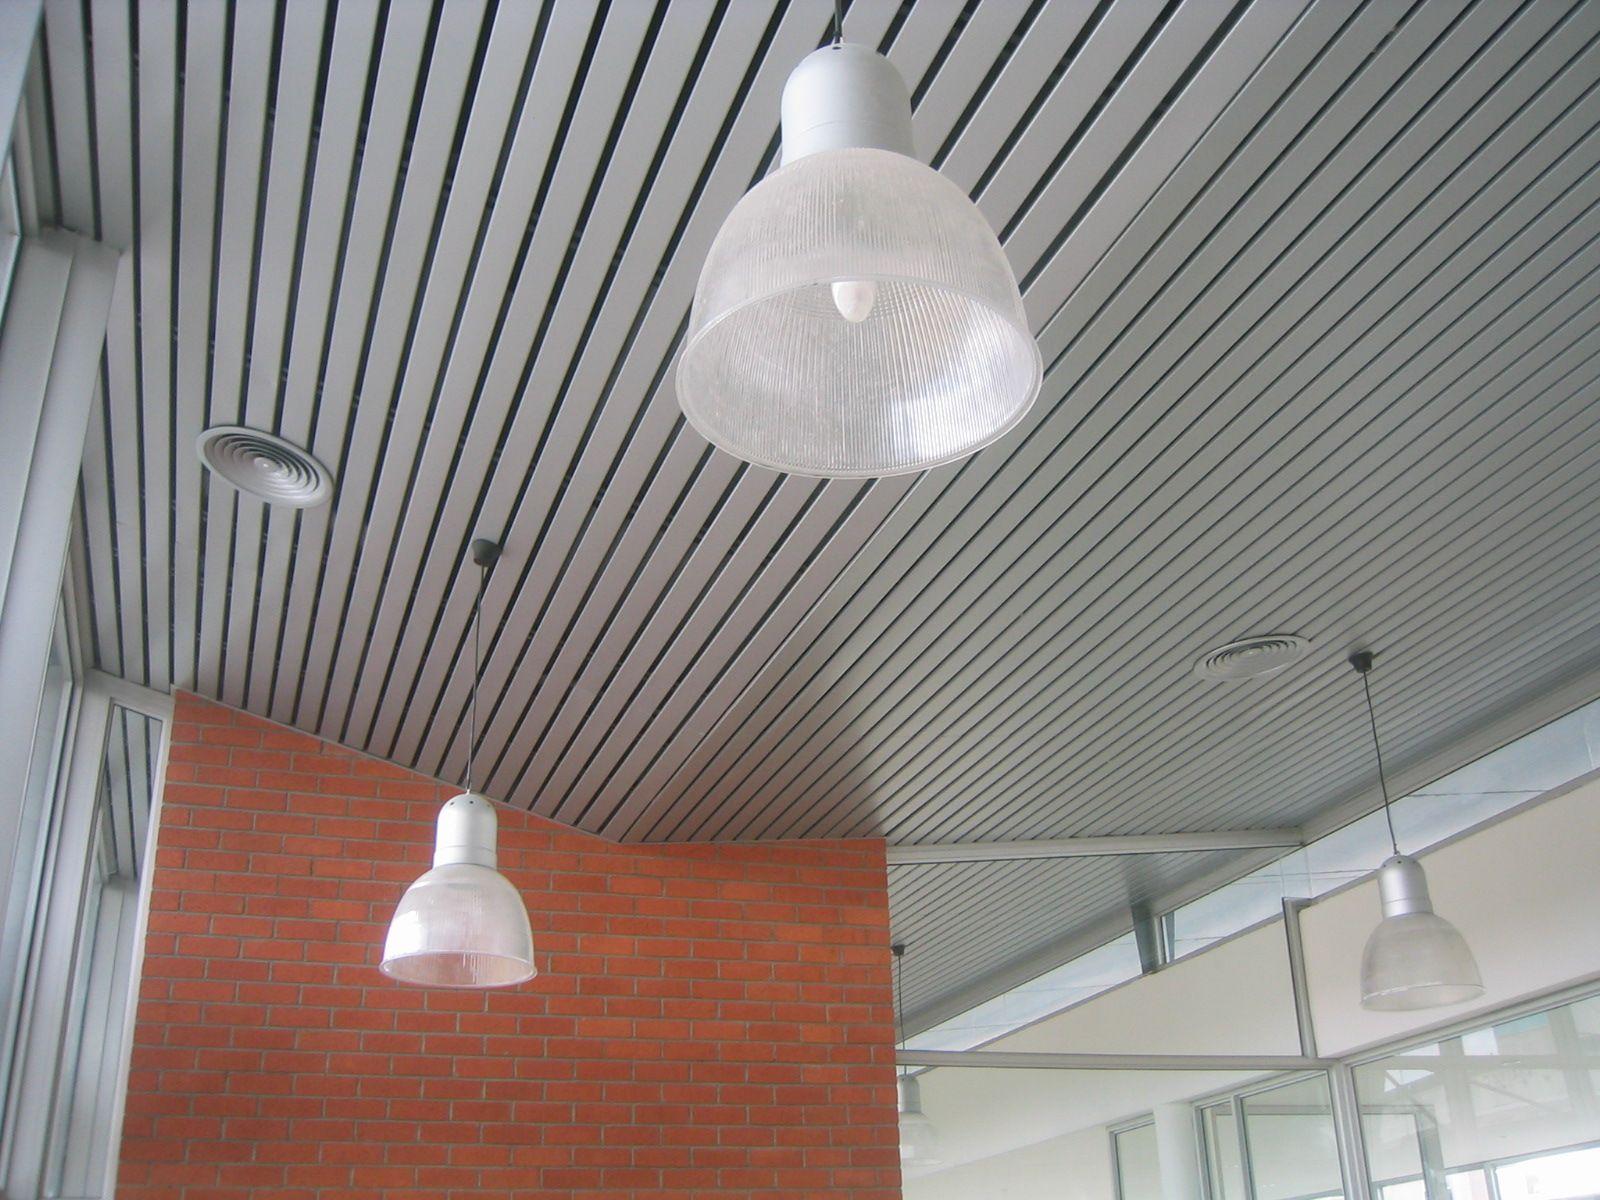 Africa Aluminium Structural Systems Designs Supplies Installs